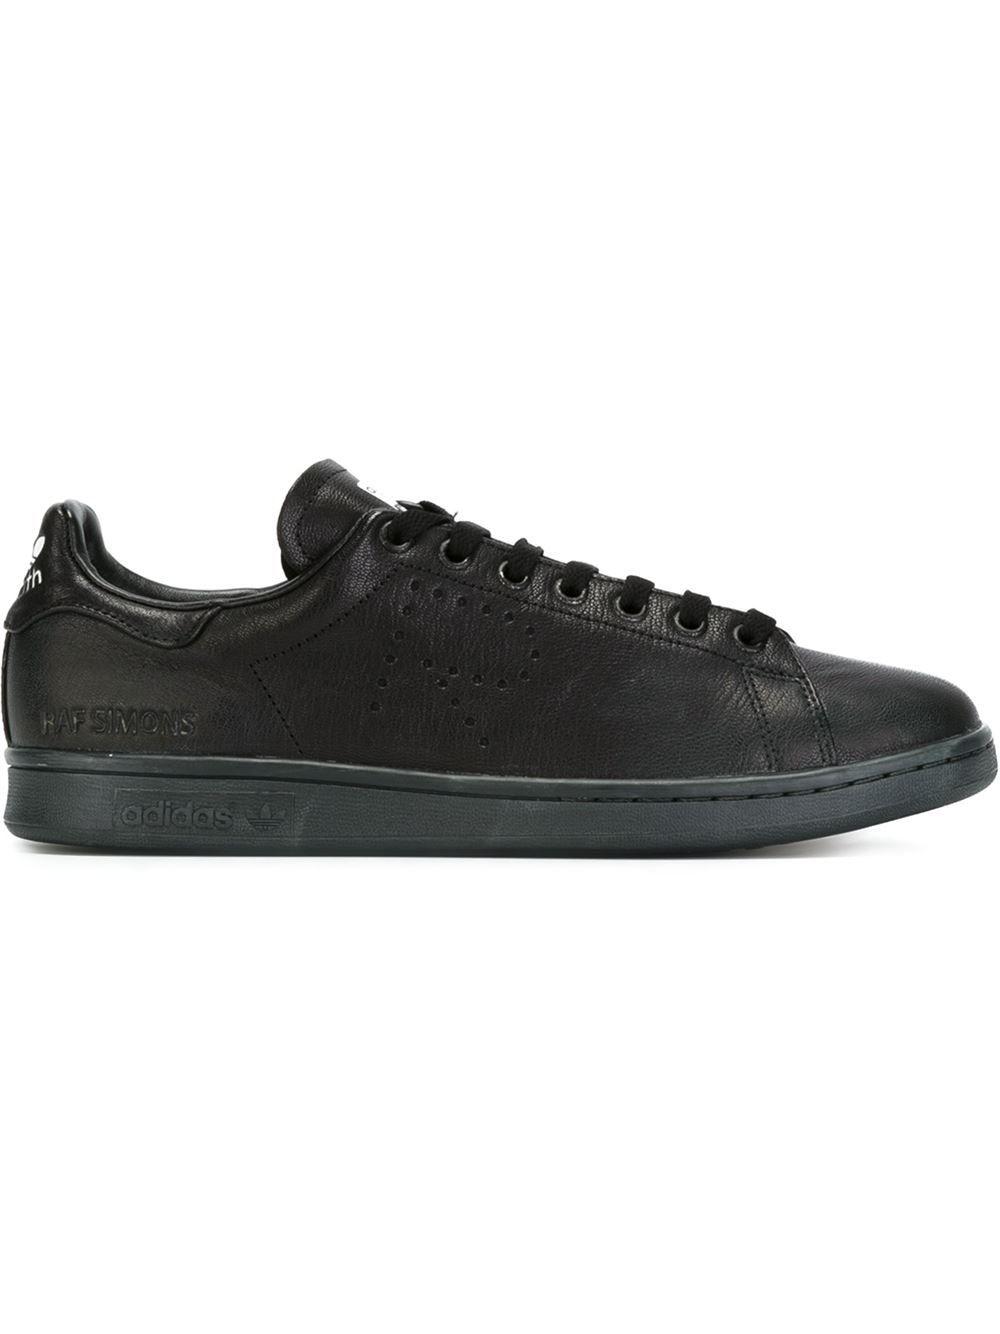 Spitze Adidas Wssxvqzc Considerable For Sneaker eodBCxr